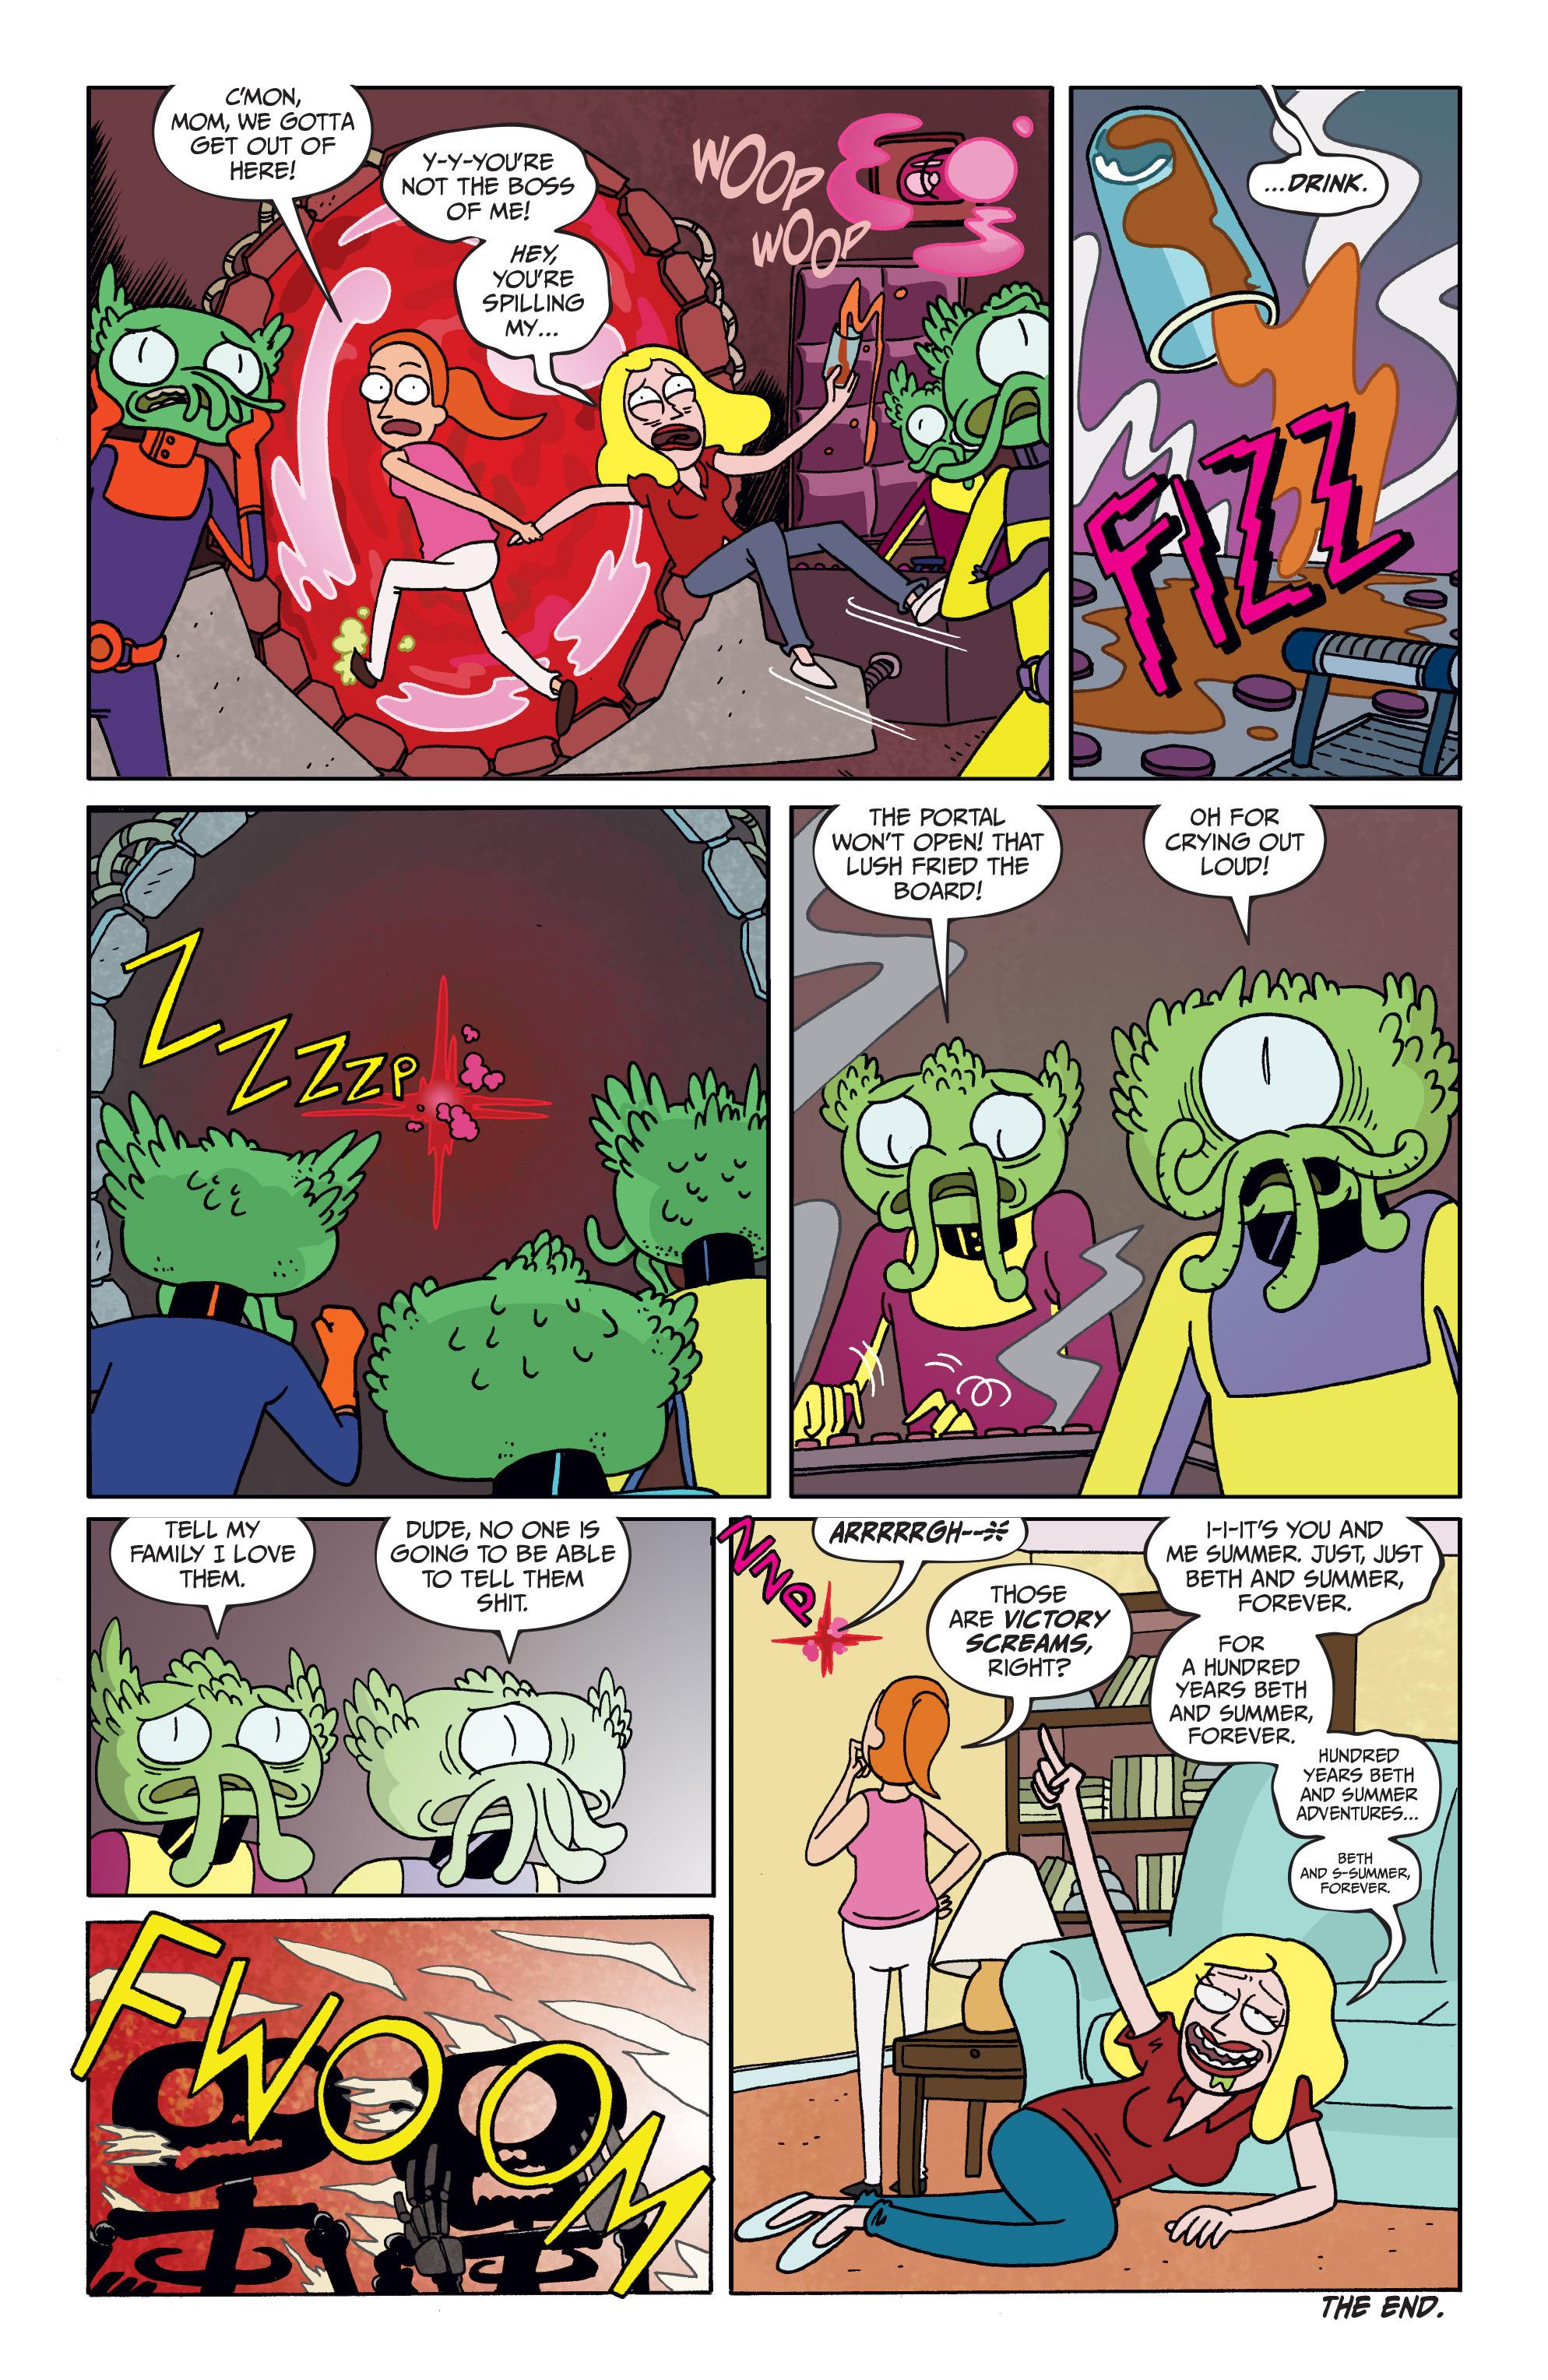 #ram comics on Tumblr